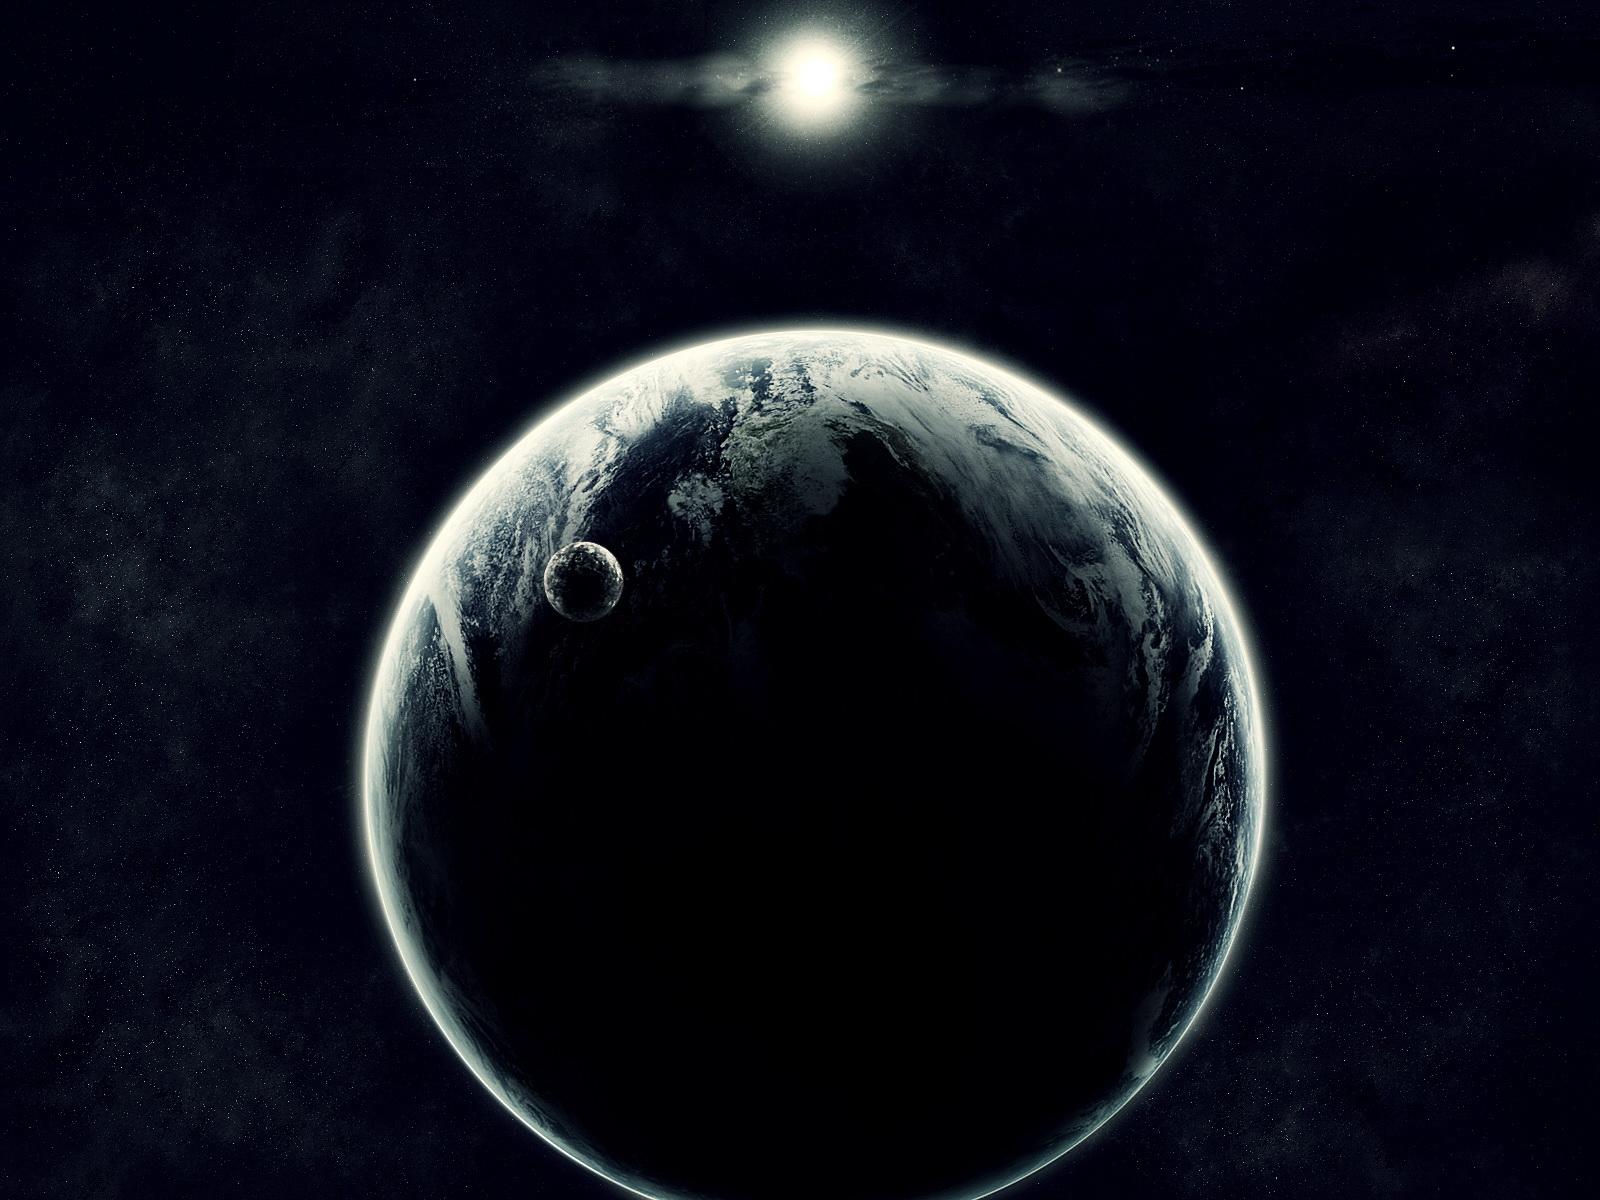 Hd Clean Wallpapers Black Earth